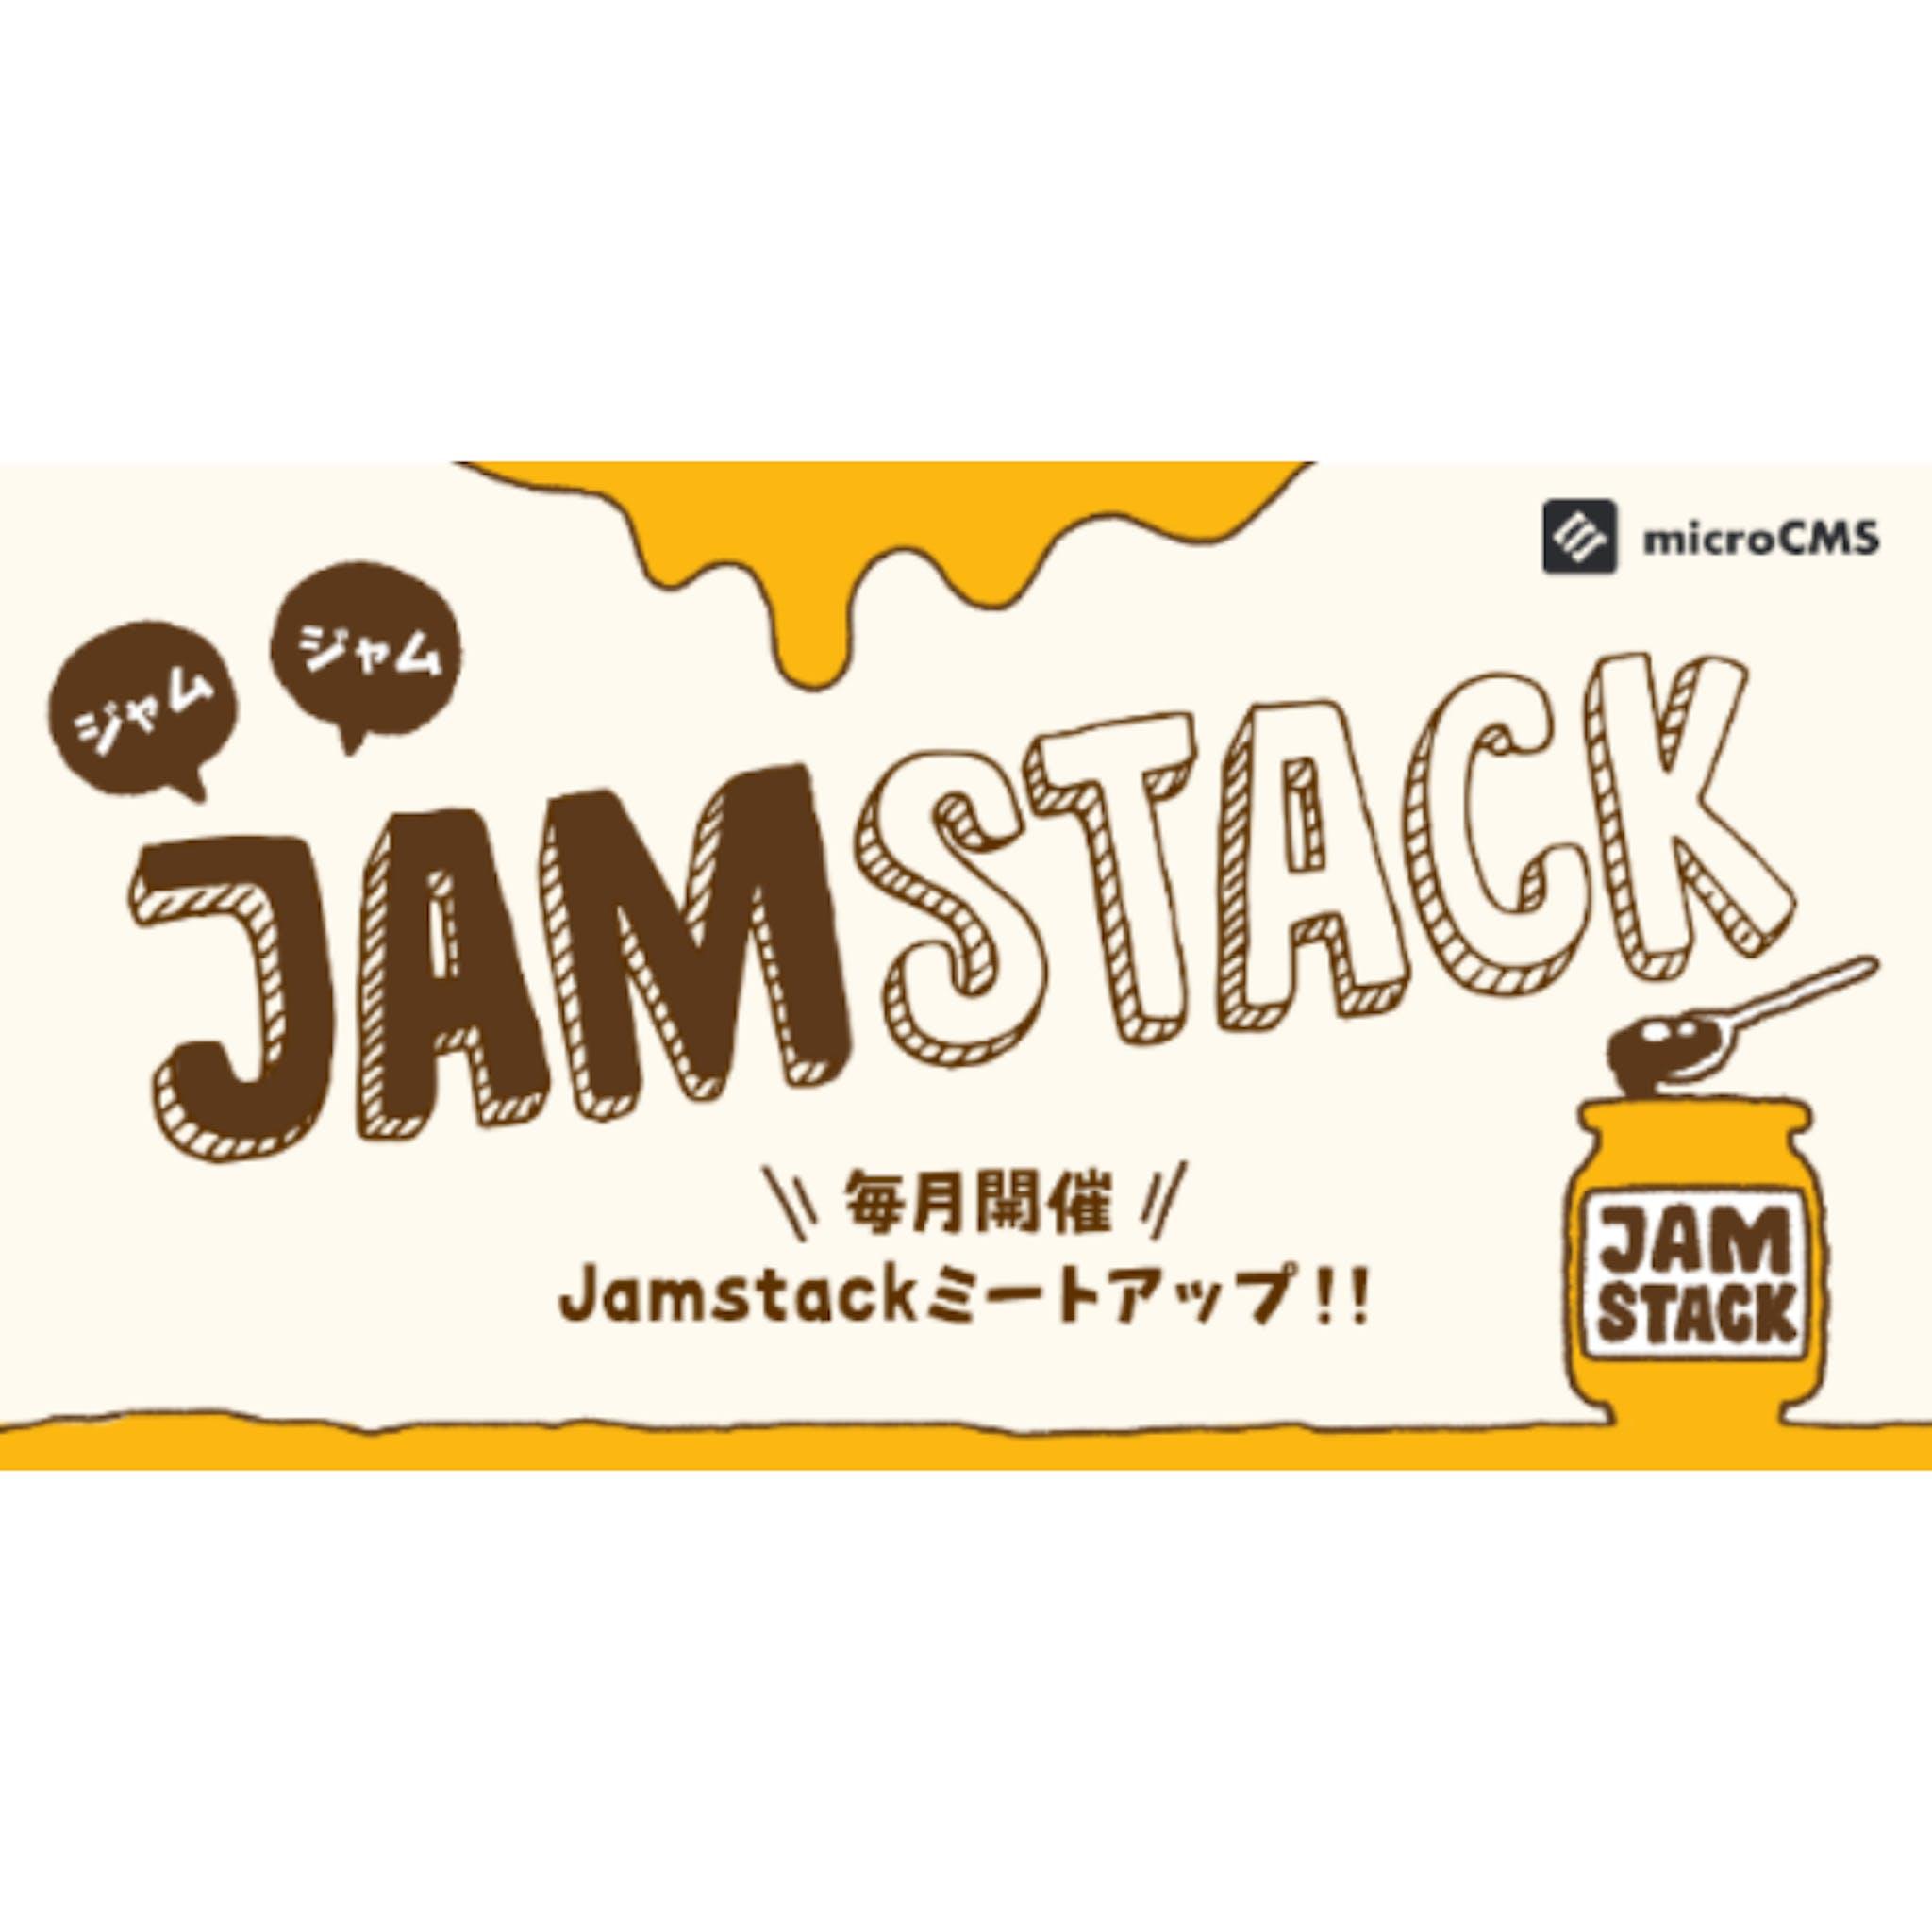 Jamstack勉強会「ジャムジャム!!Jamstack」に参加しました